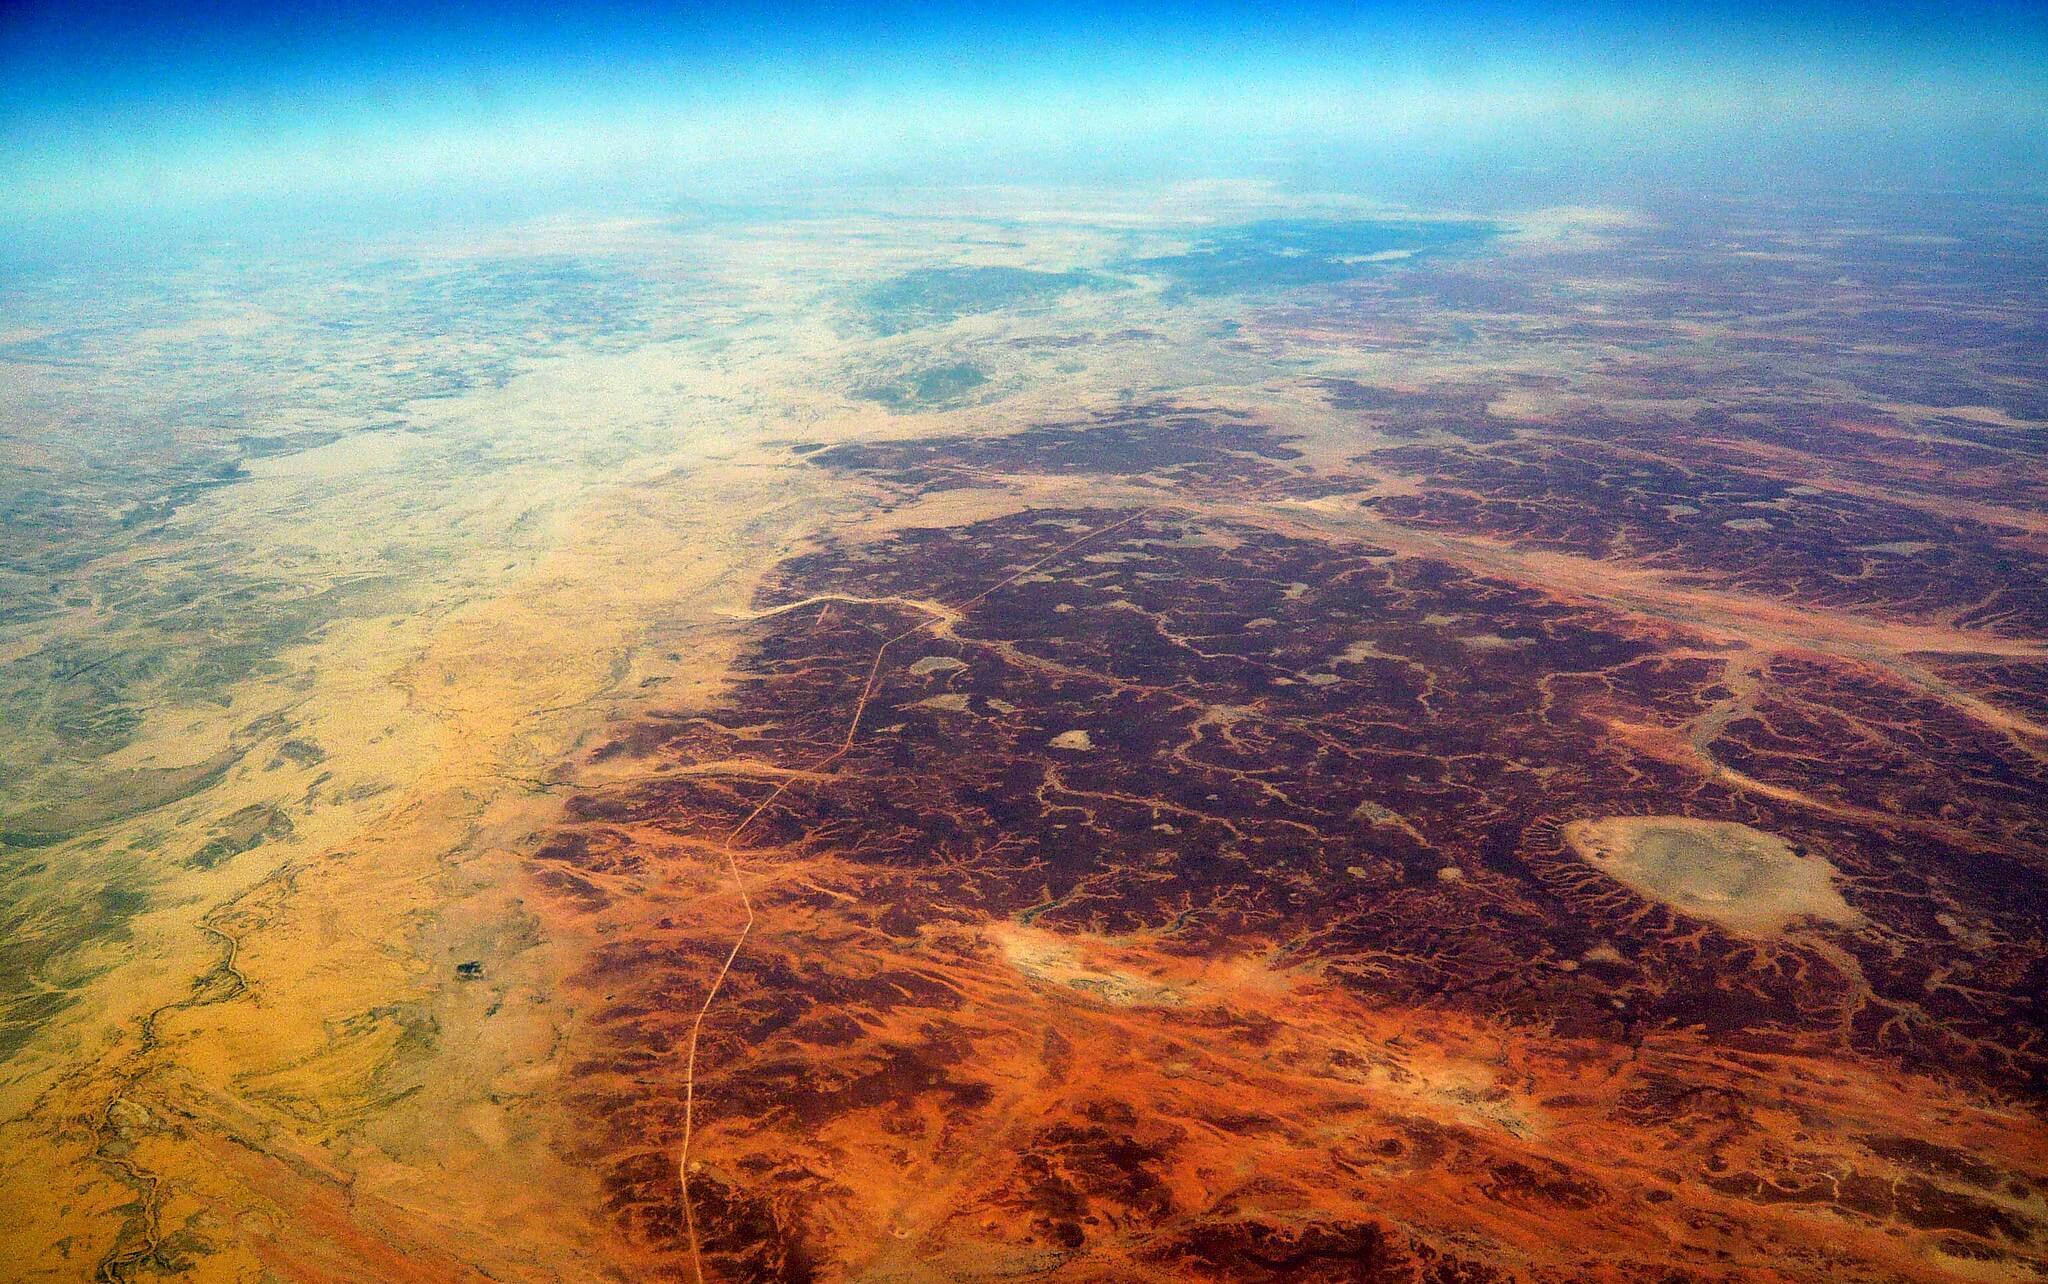 Outback australiano Viajar a Uluru